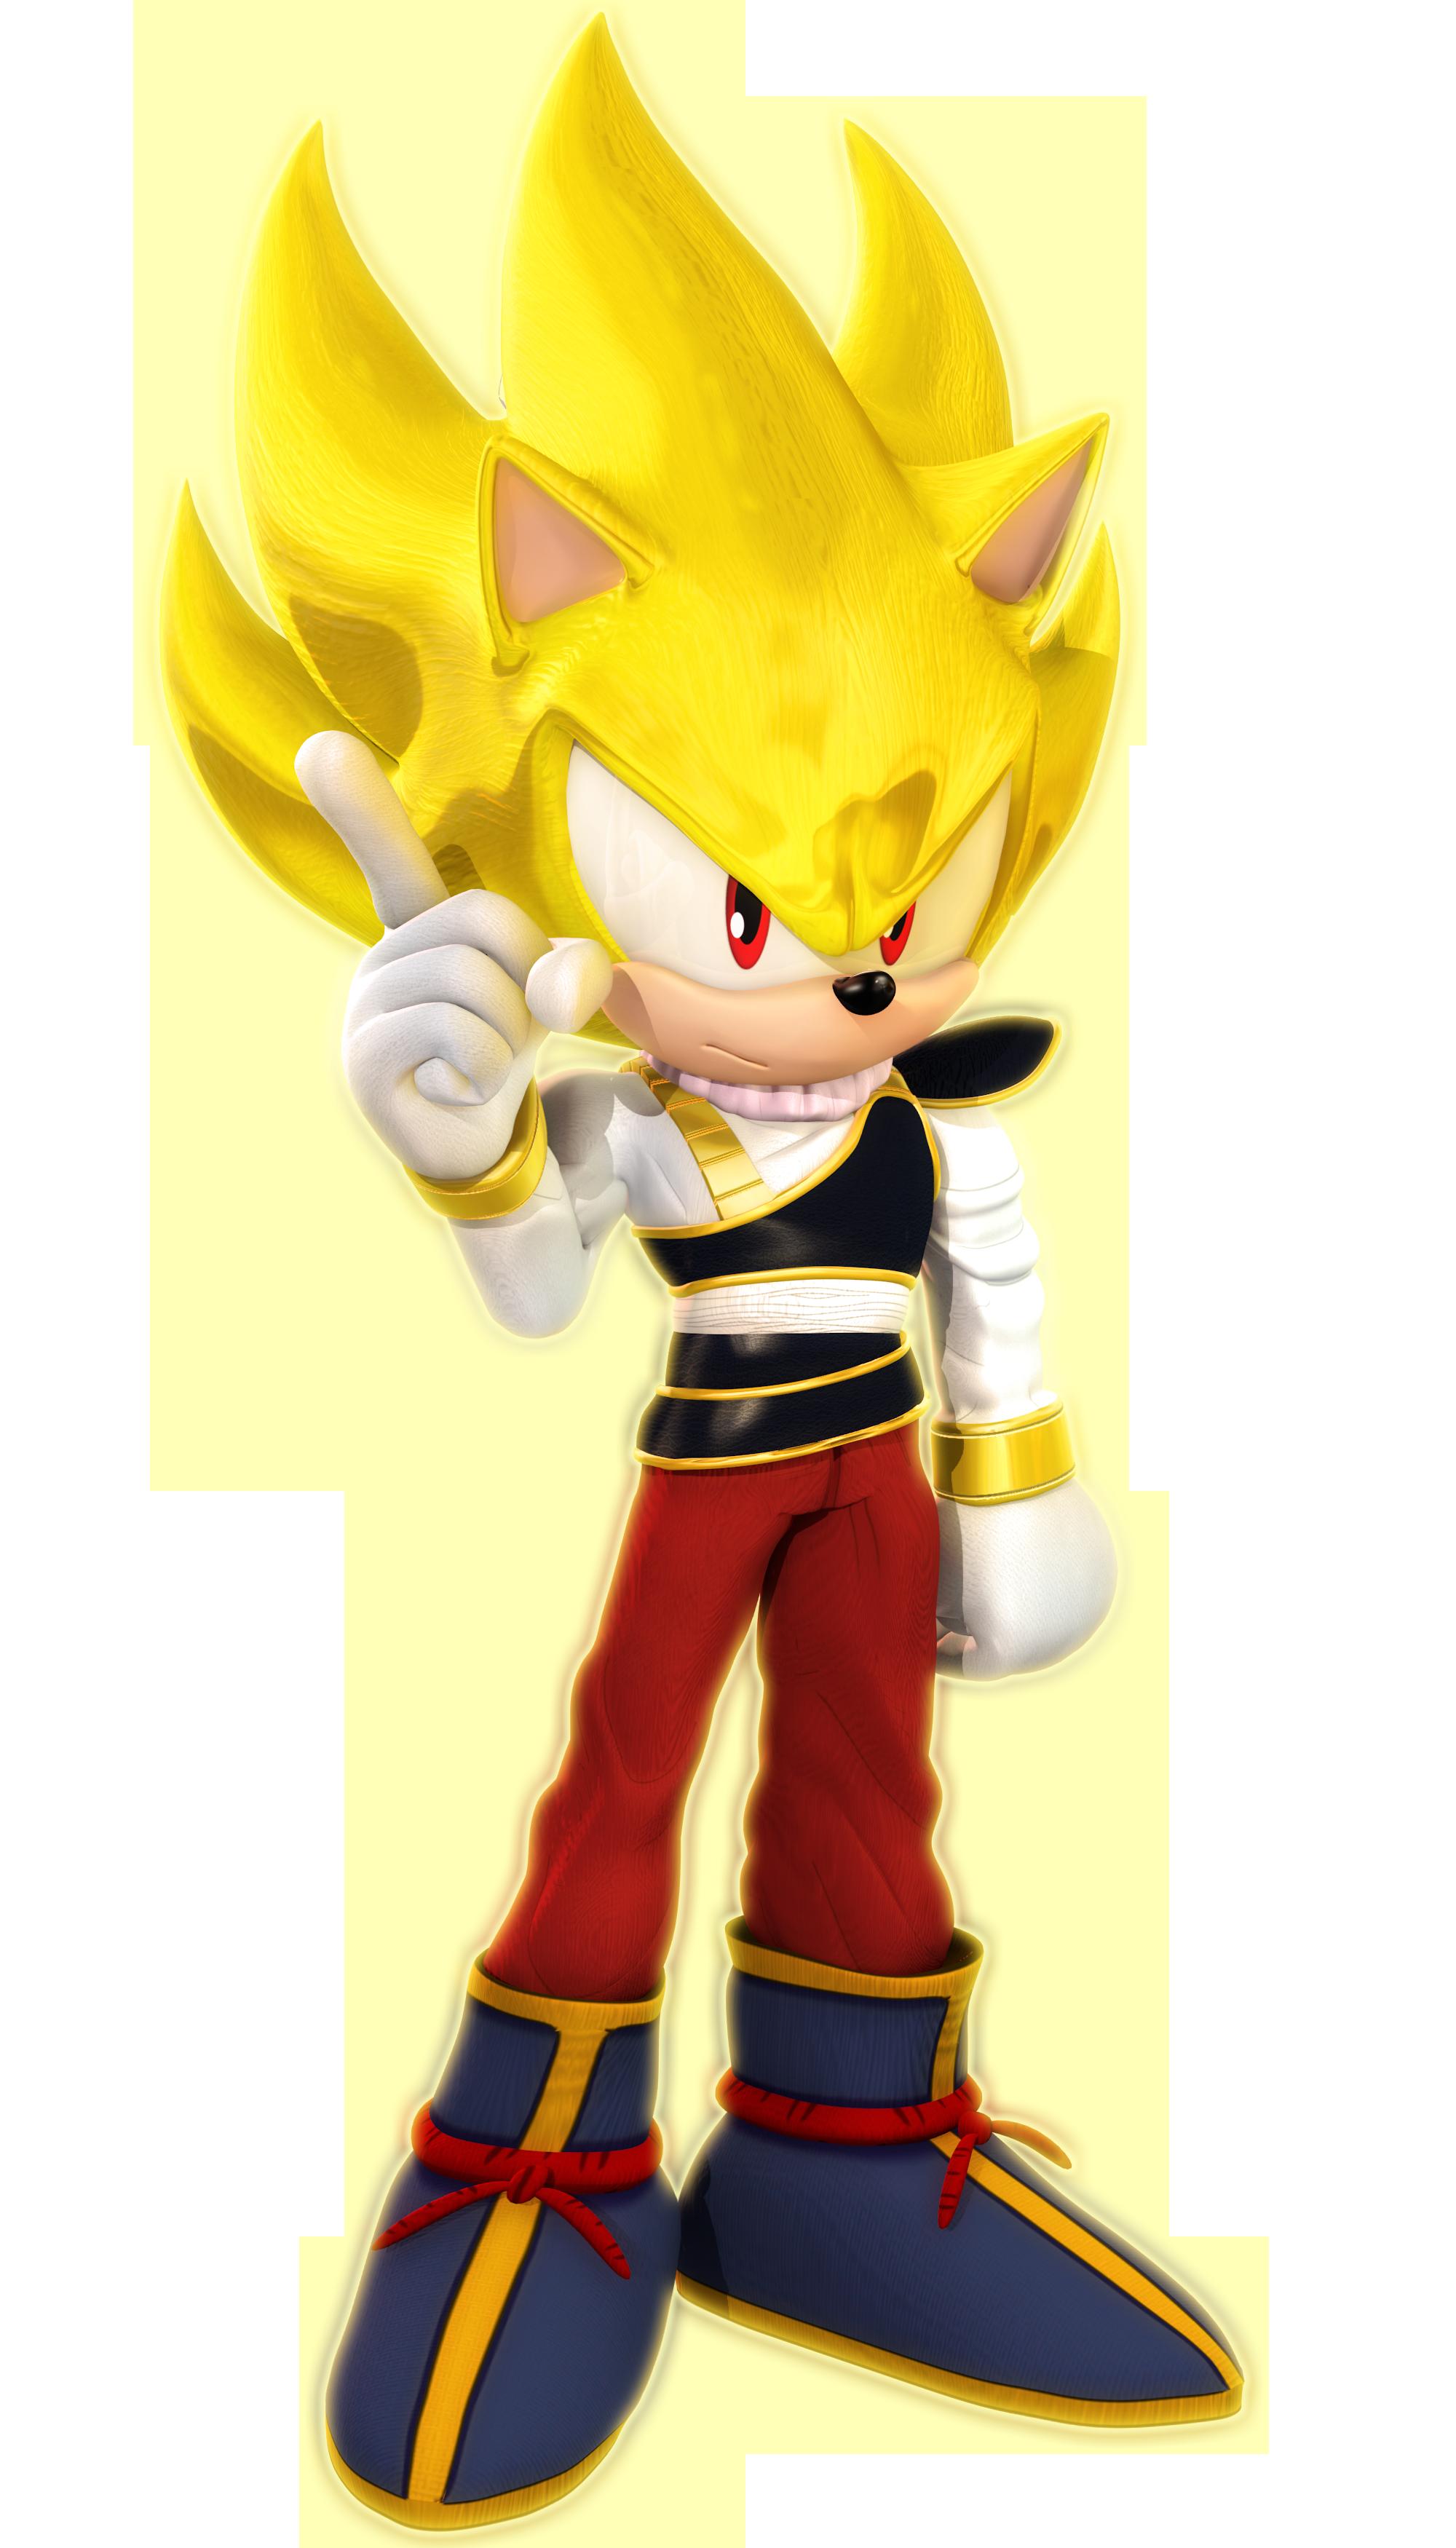 Super Sonic The Yardrat Render By Nibroc Rock On Deviantart Sonic Hedgehog Movie Honey The Cat